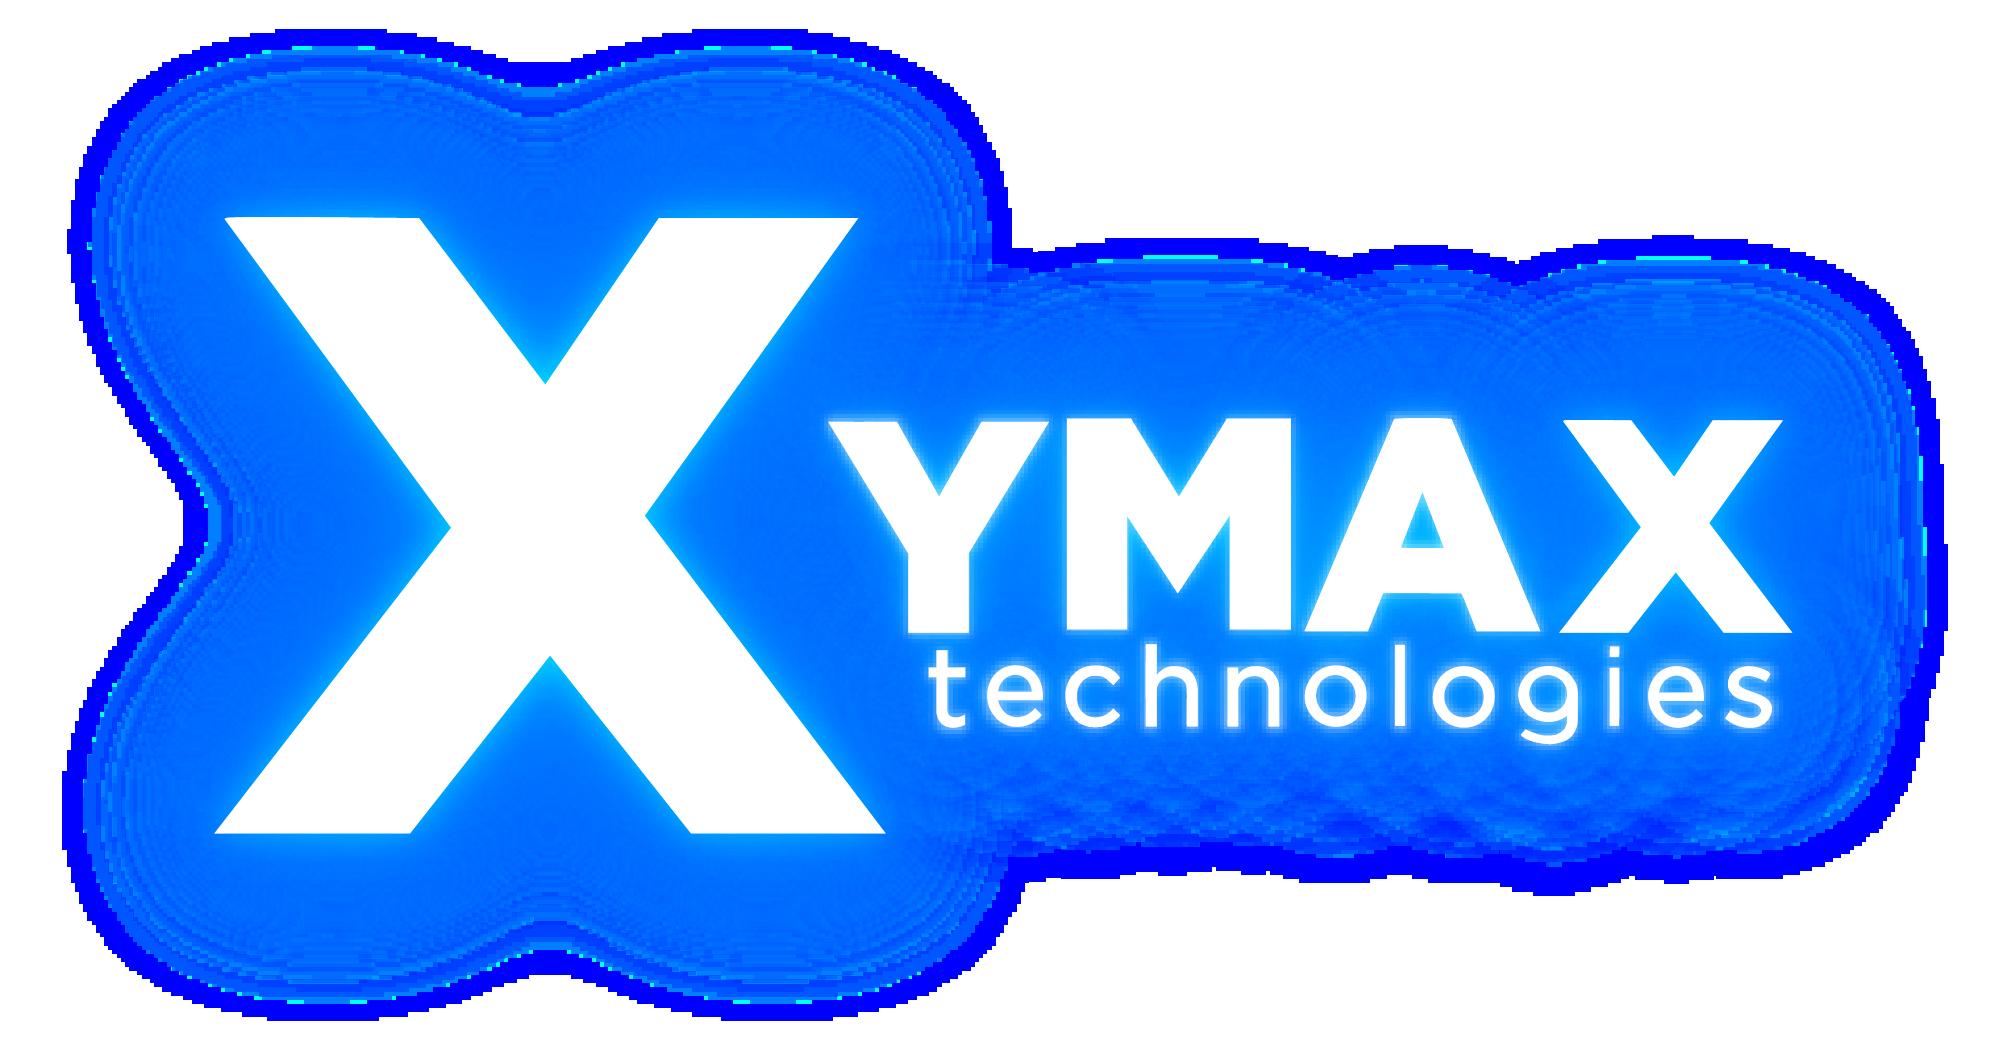 Xymax Technologies